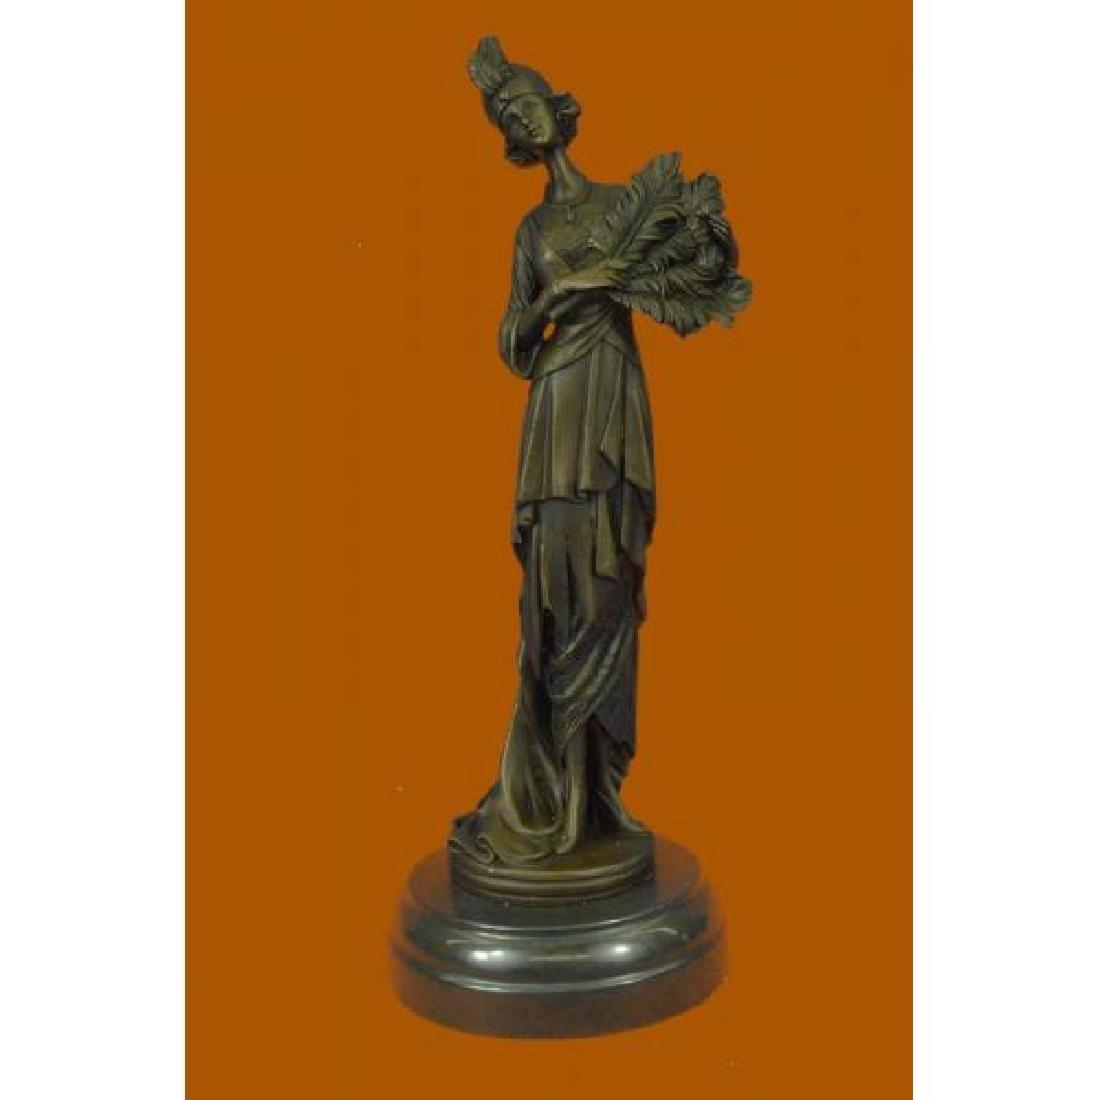 Kassin 1920 Art Deco Style Woman Bronze Sculpture